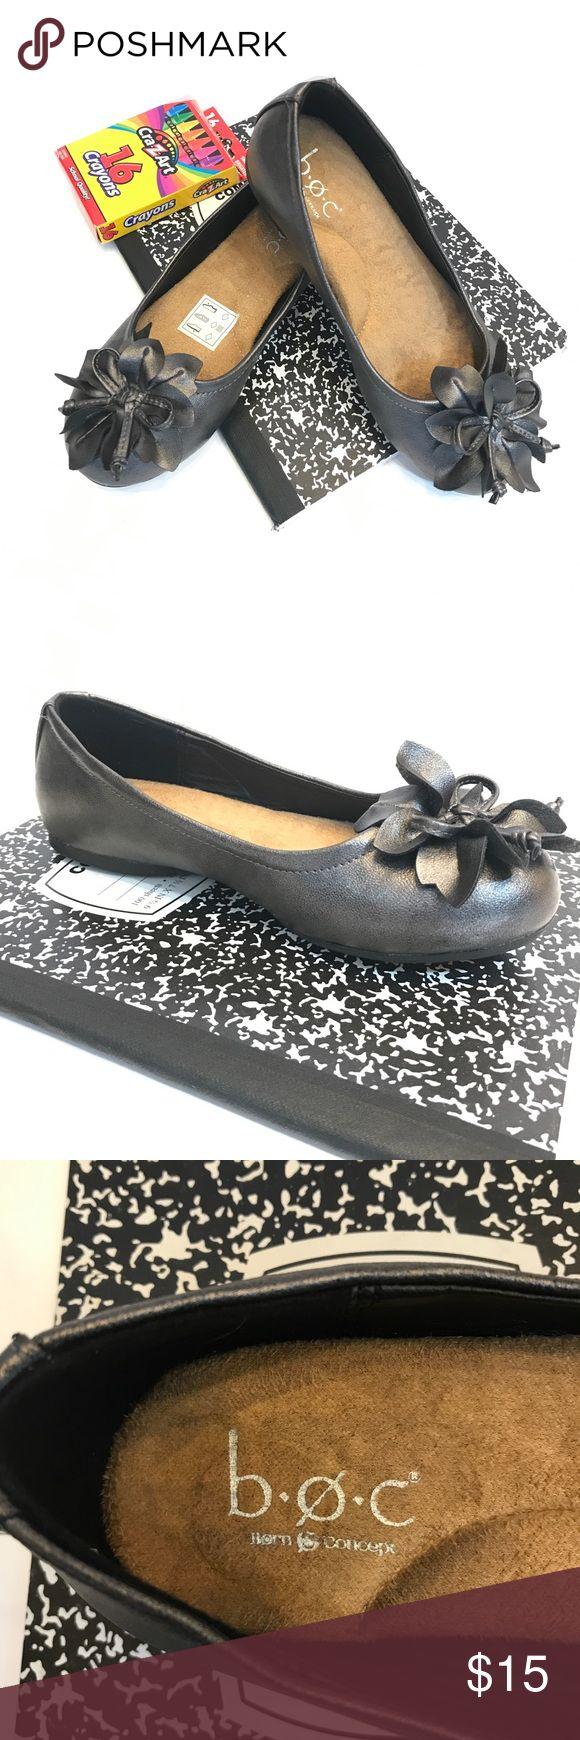 NWOB b.o.c. Girls Ballet Flats NWOB. B.O.C. Girls Ballet Flats, Sz 1. b.o.c. Shoes Dress Shoes